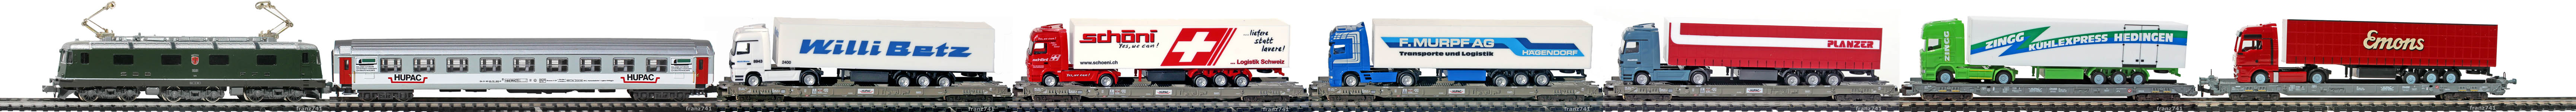 Epoche-IV-SBB-HUPAC-RoLa-Gueterzug_Re-6-6-Elok-Niederflurwagen-Typ-Saadkms